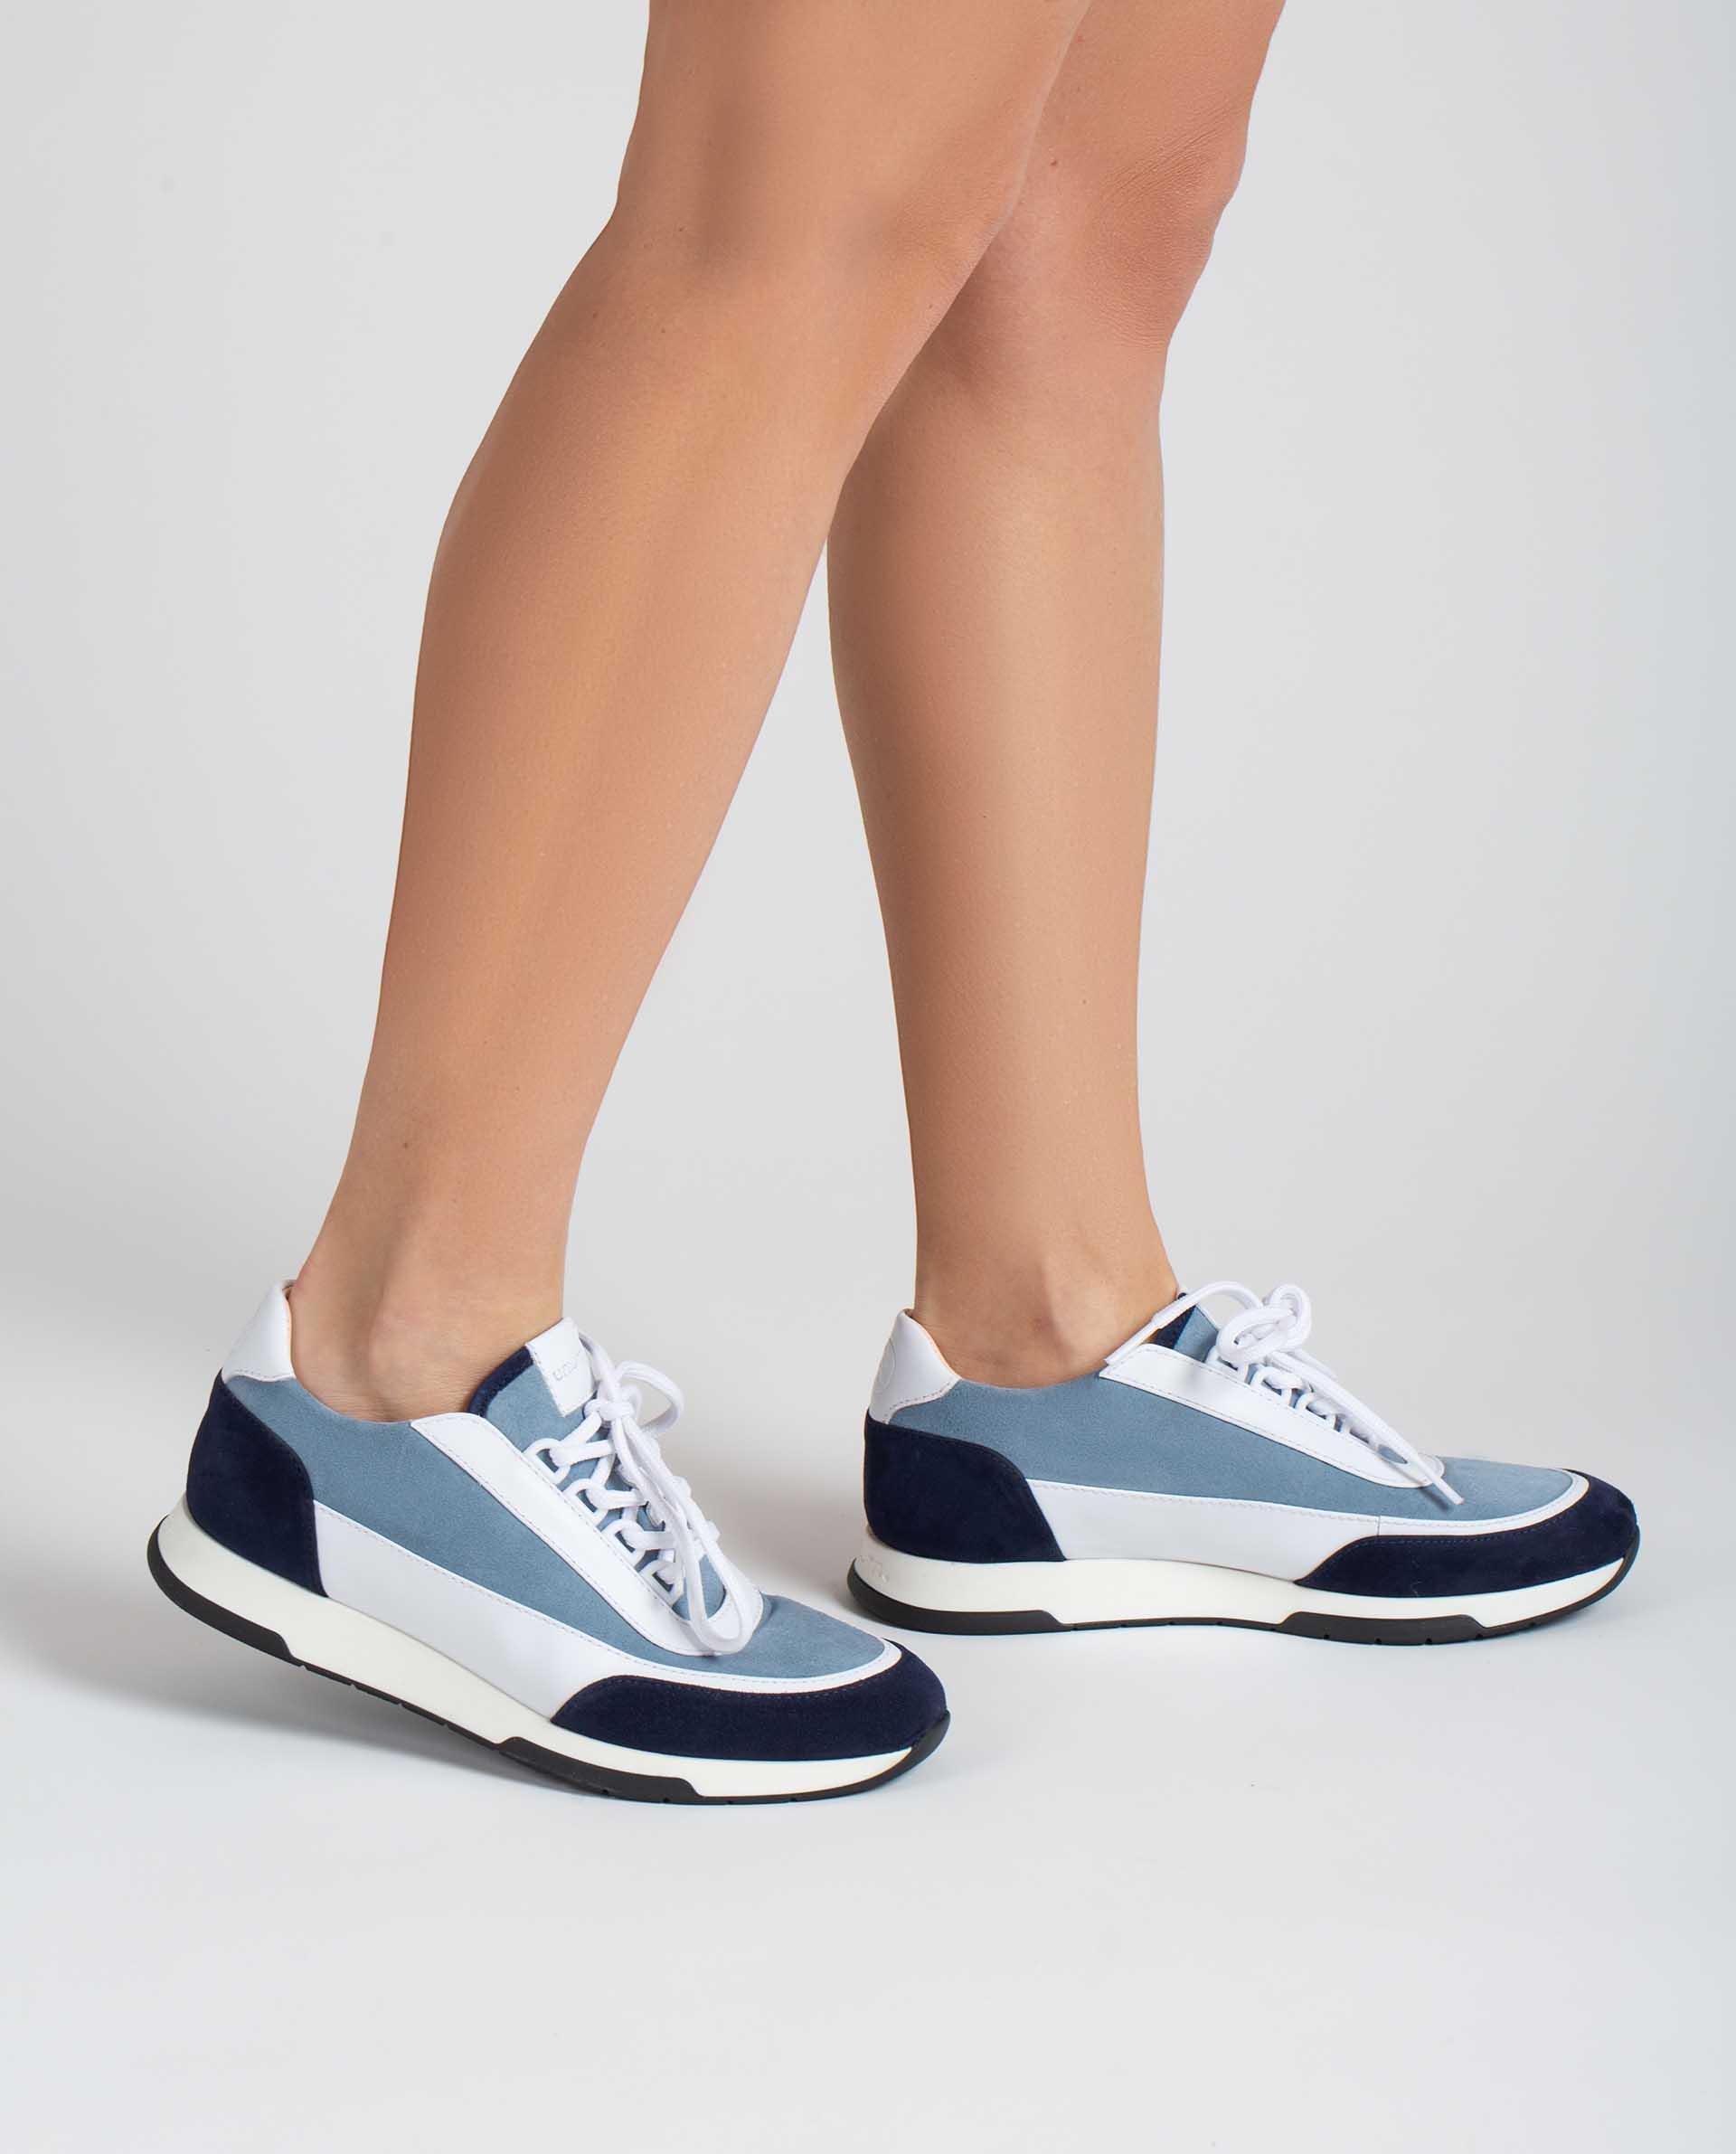 UNISA Sneaker in Materialmix FATI_21_KS 5